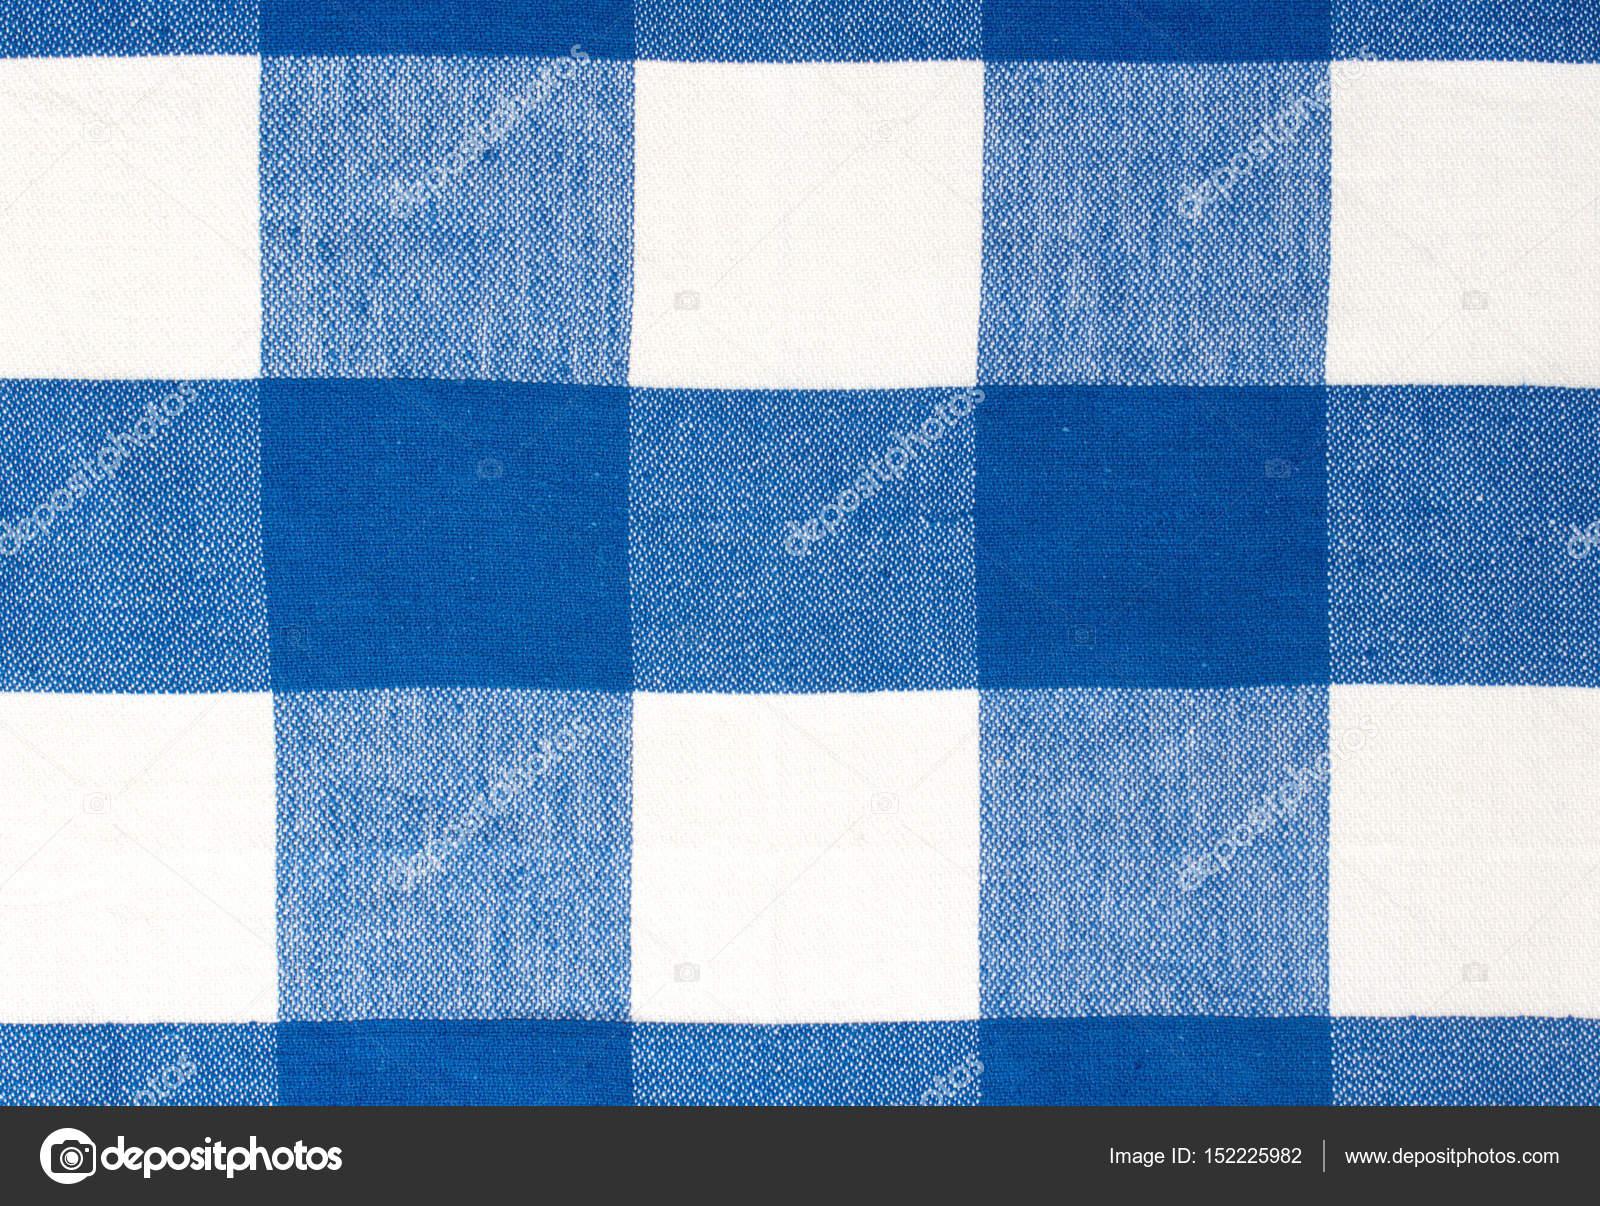 Blaue Picknick Tuch Textile Hintergrund — Stockfoto © NYS #152225982